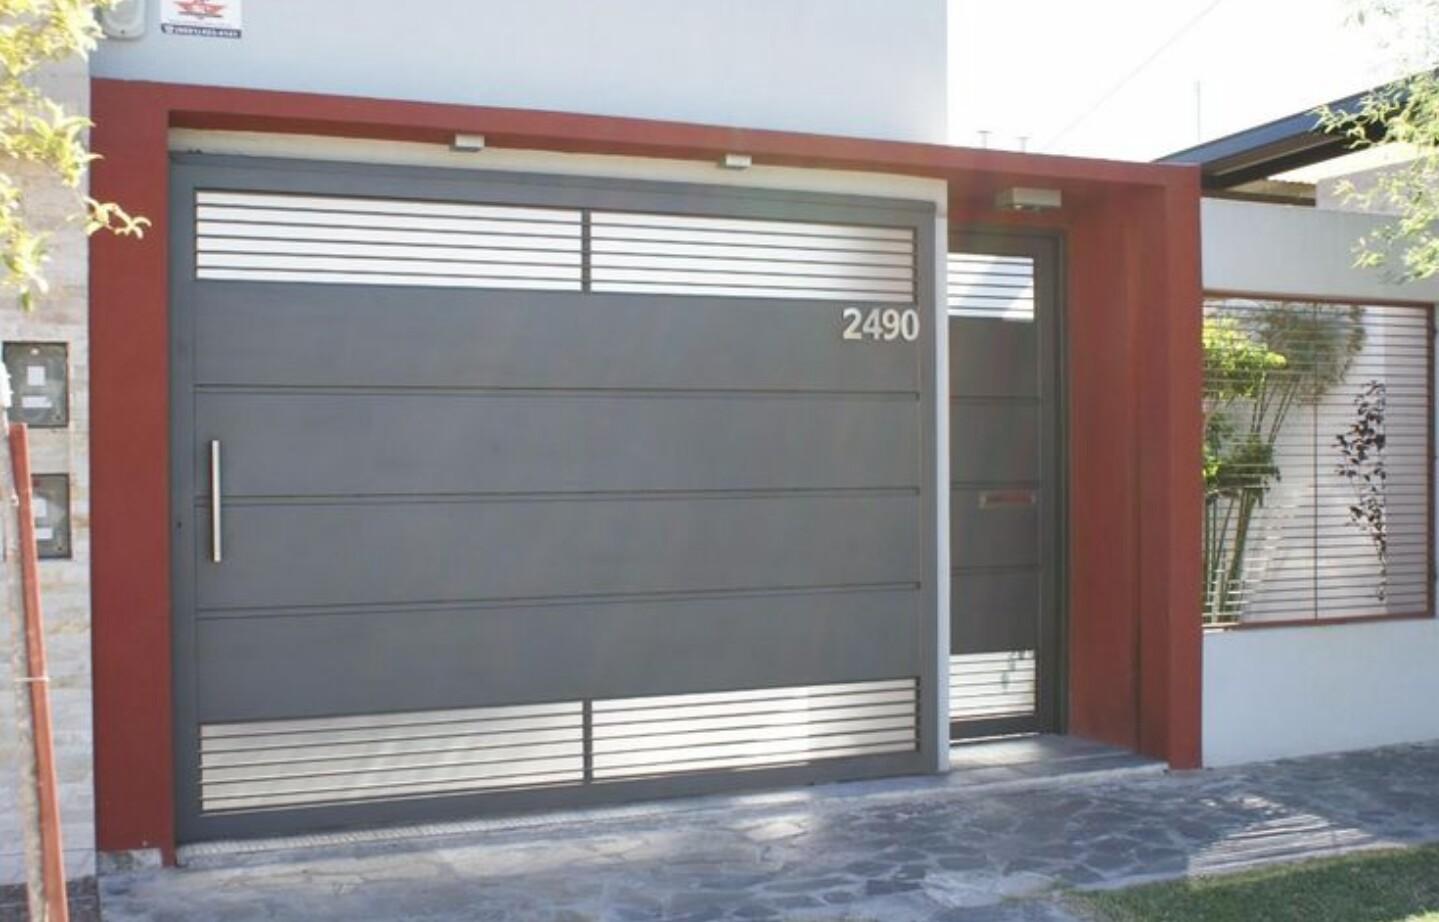 Portones de garaje top puerta garaje de aluminio with for Portones de garaje